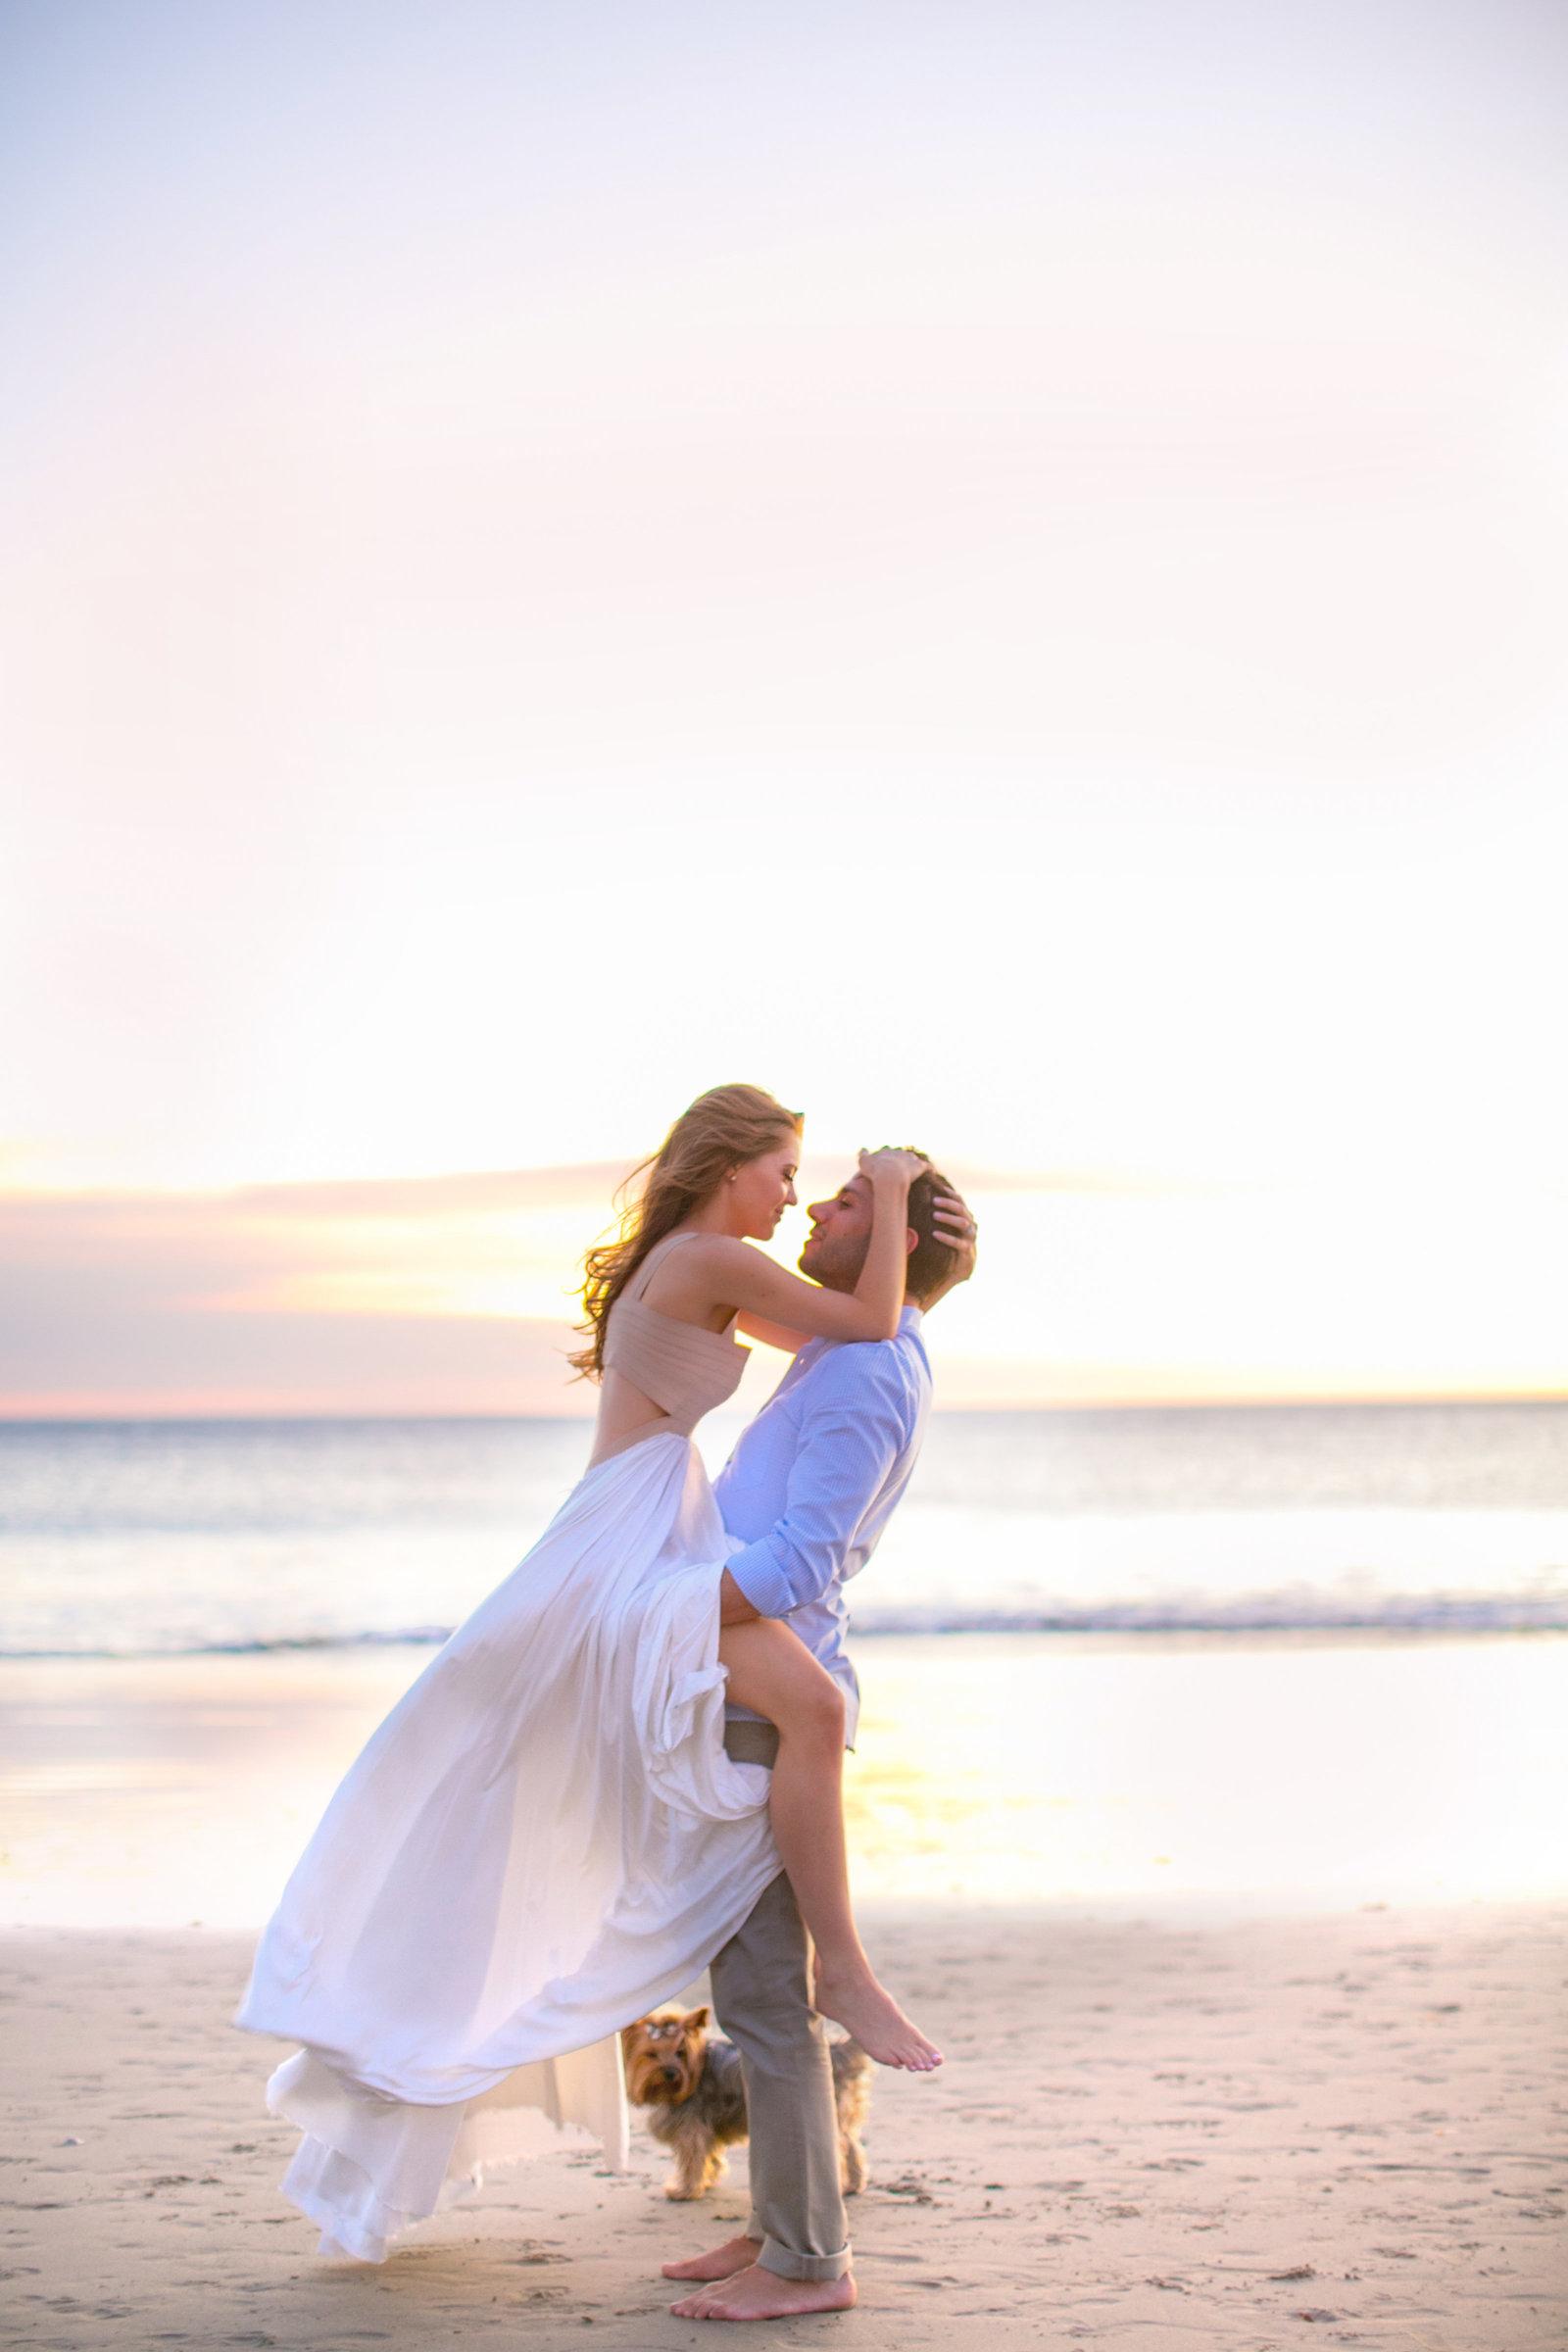 Wedding Photography Southern California: Home [jana-williams.com]